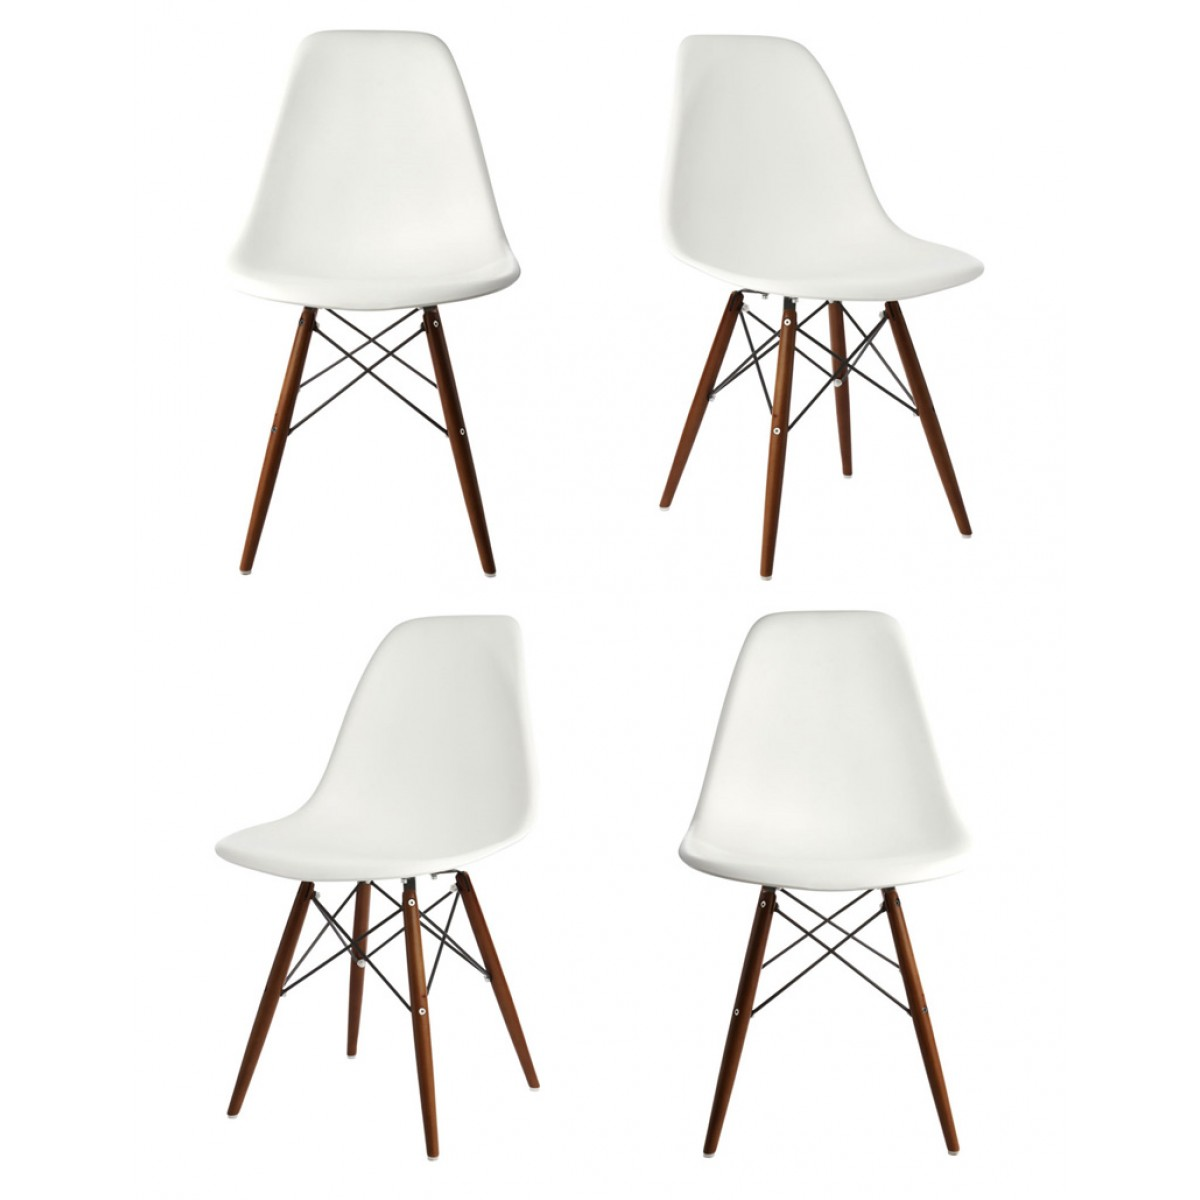 Elegant Set Of 4 DSW Molded White Plastic Dining Shell Chair With Dark Walnut Wood  Eiffel Legs